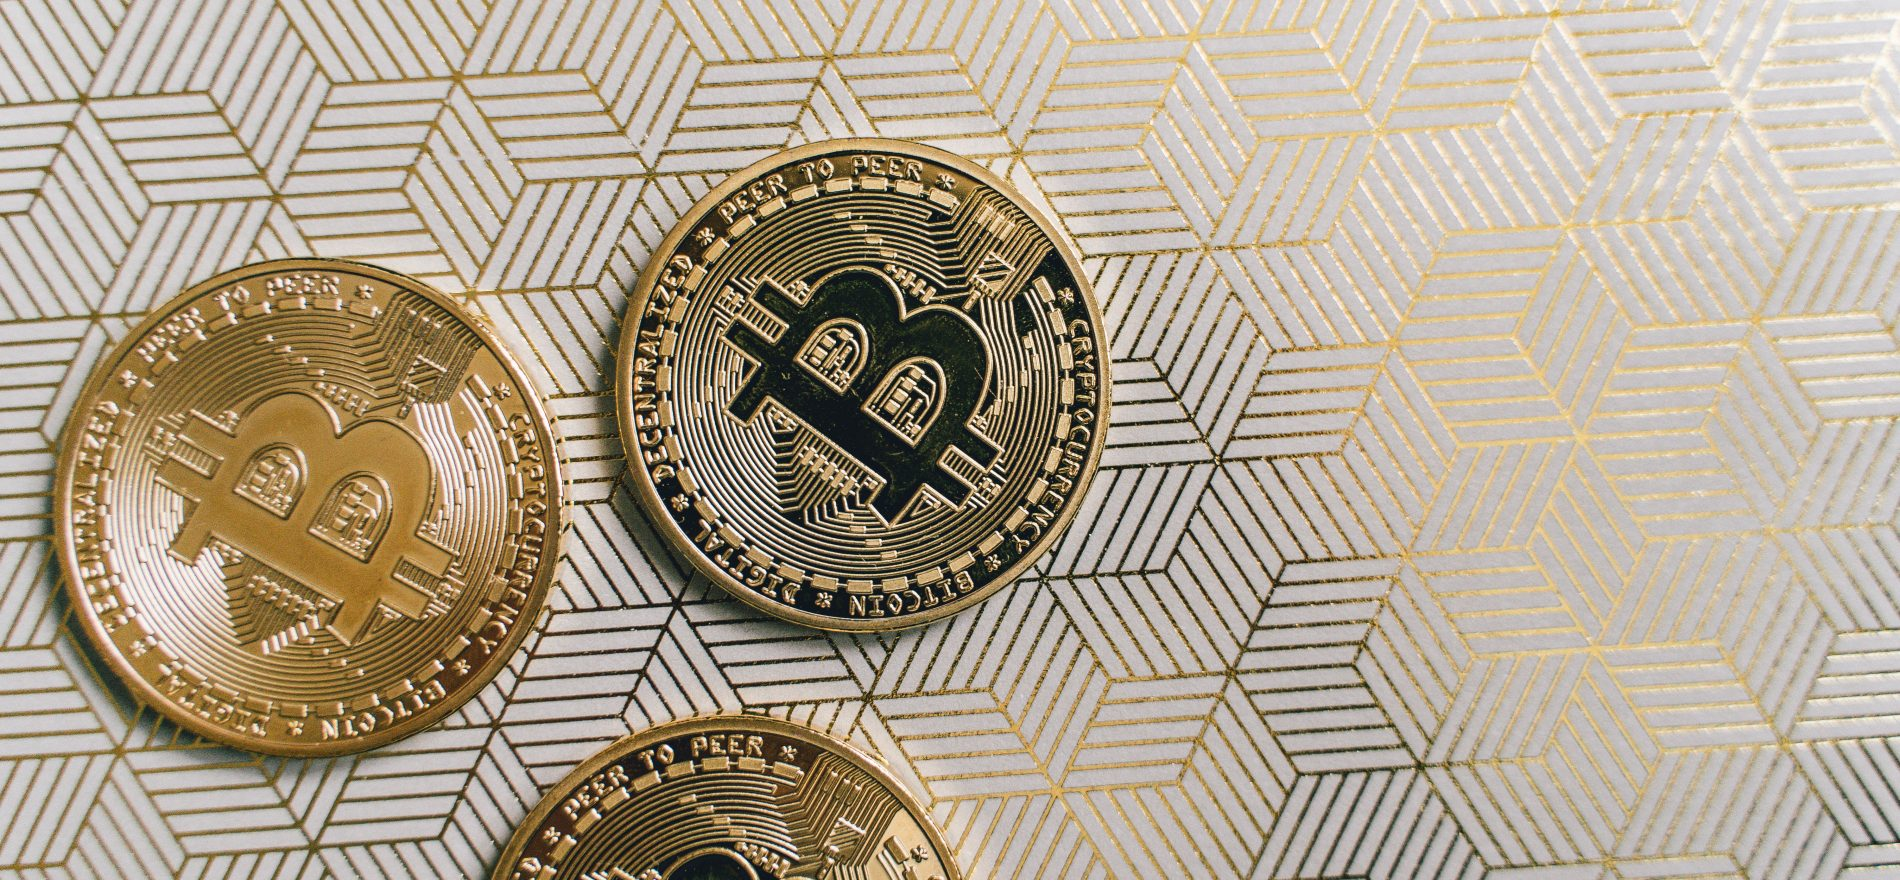 Bitcoin prijs koerst boven 50.000